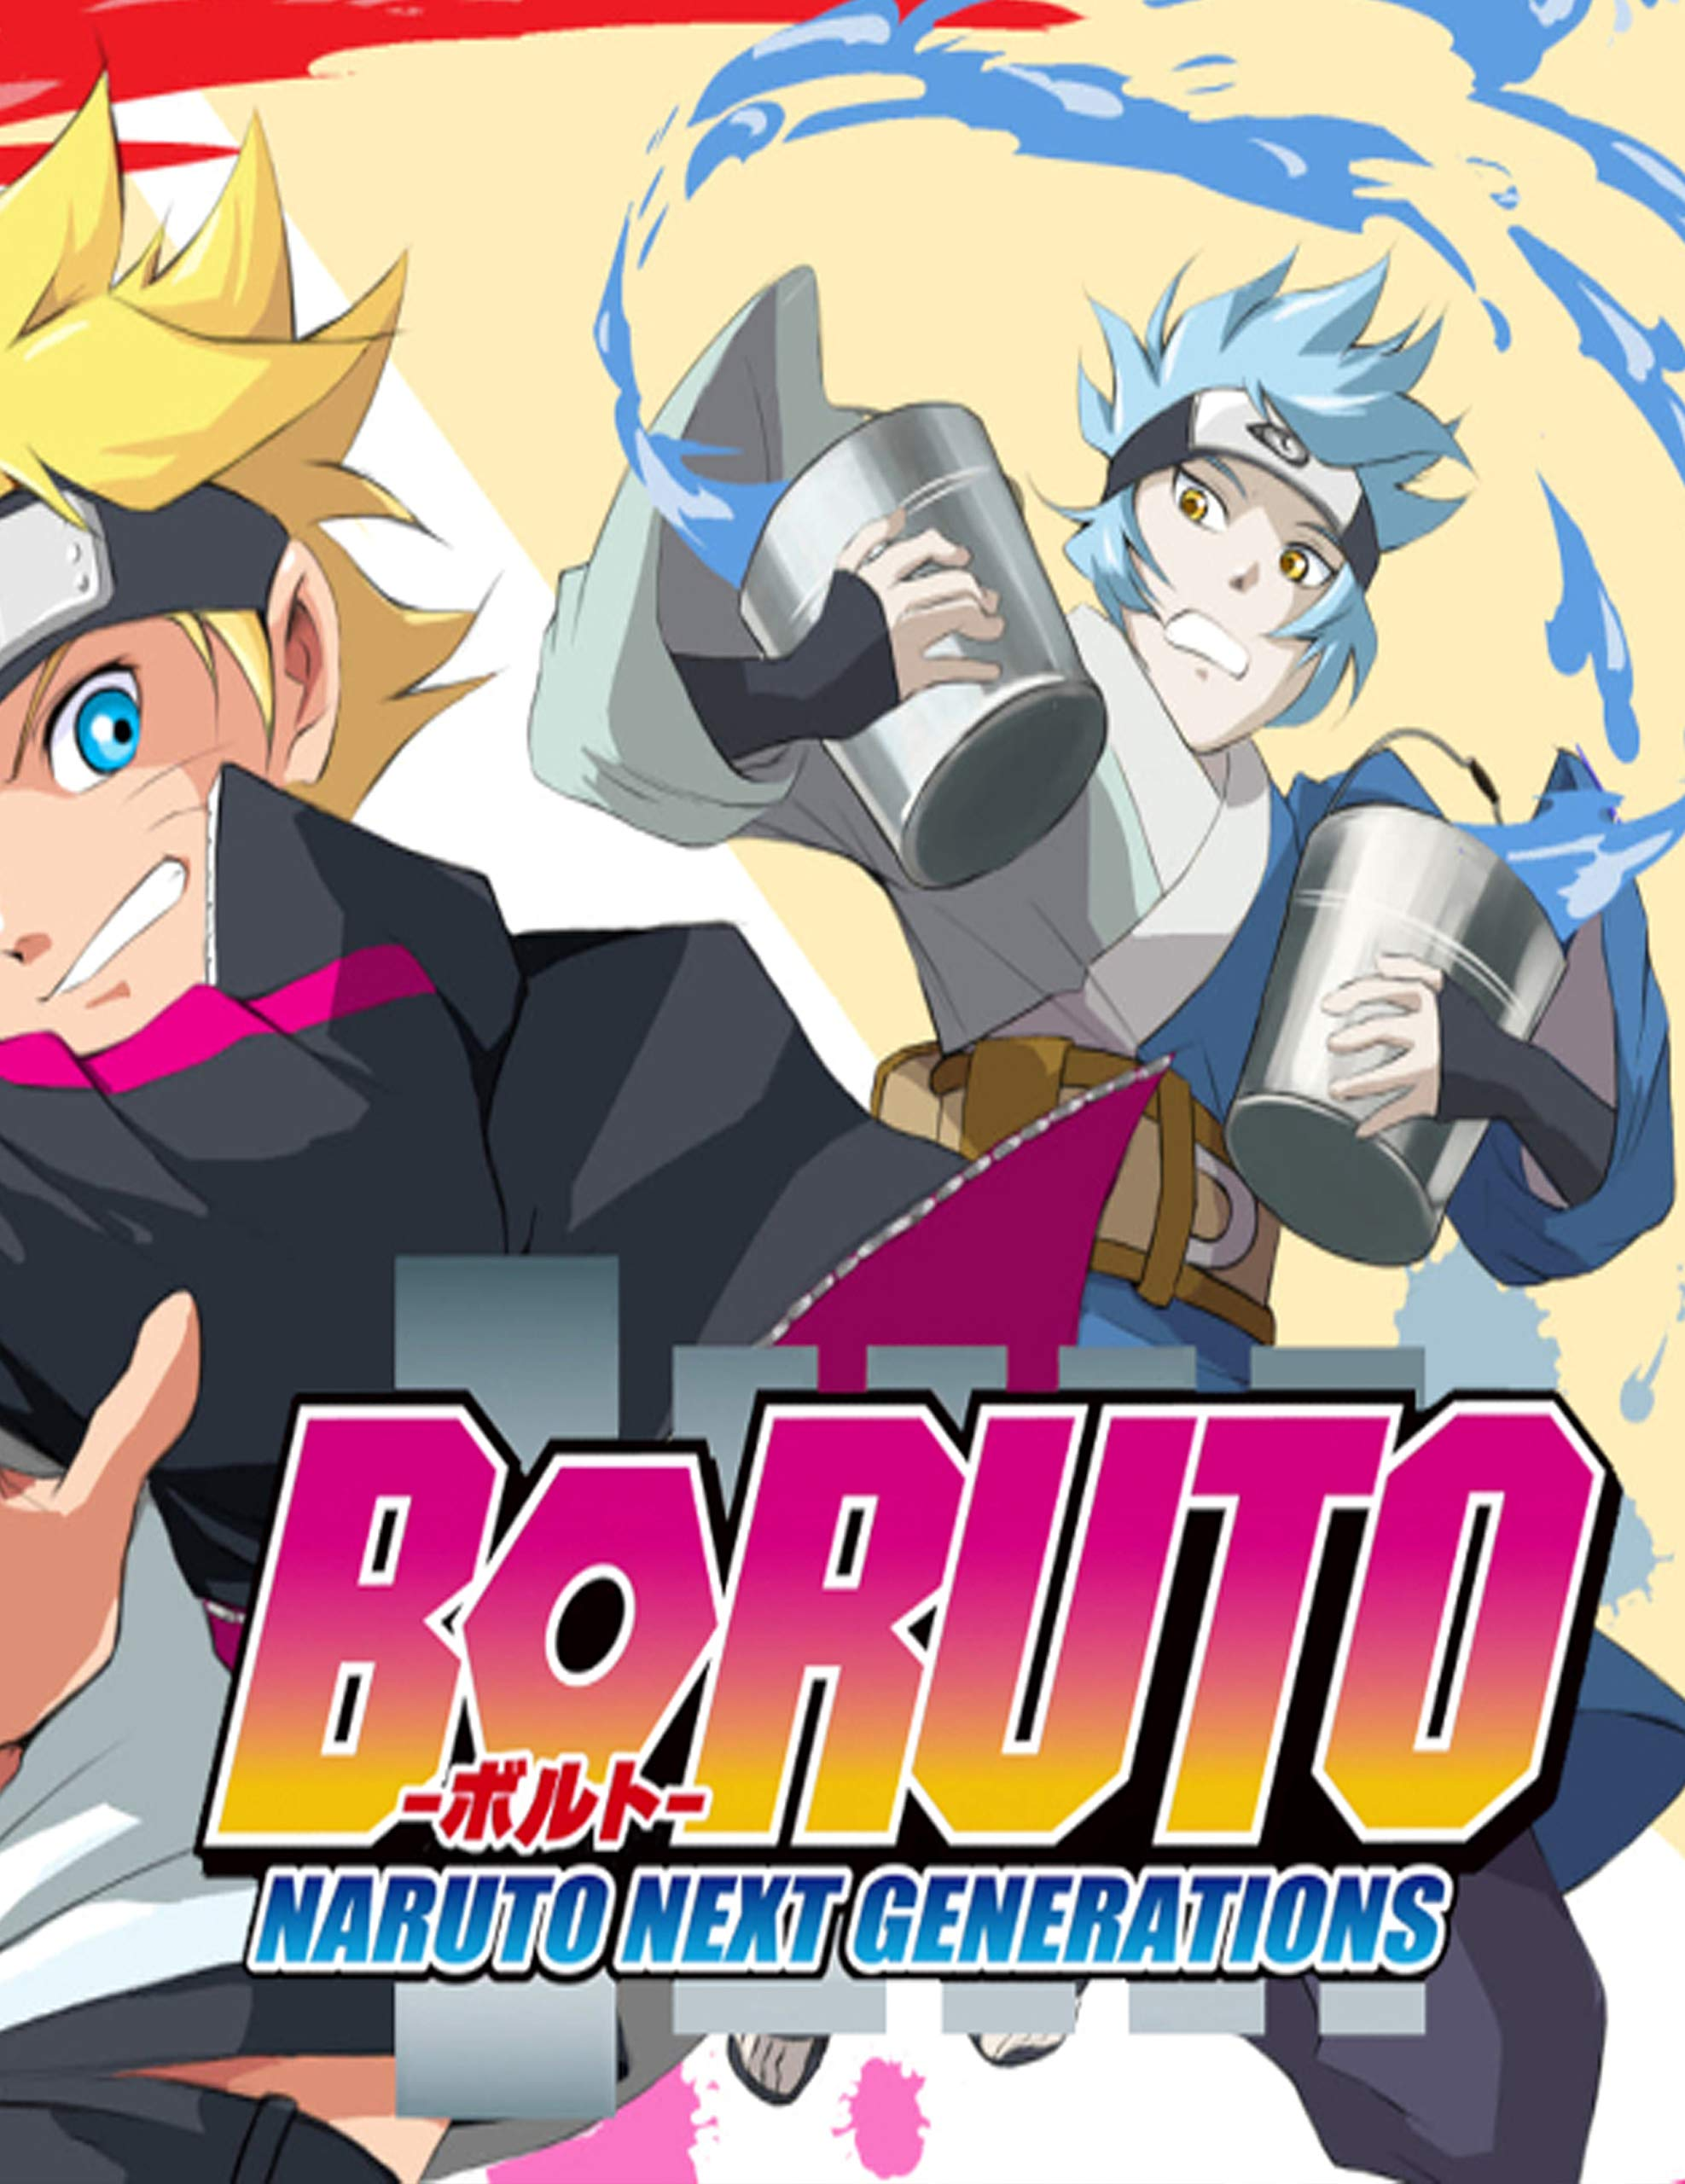 Naruto Next Generations Deluxe Manga Adventure: Boruto Manga best manga Adventure Vol 3